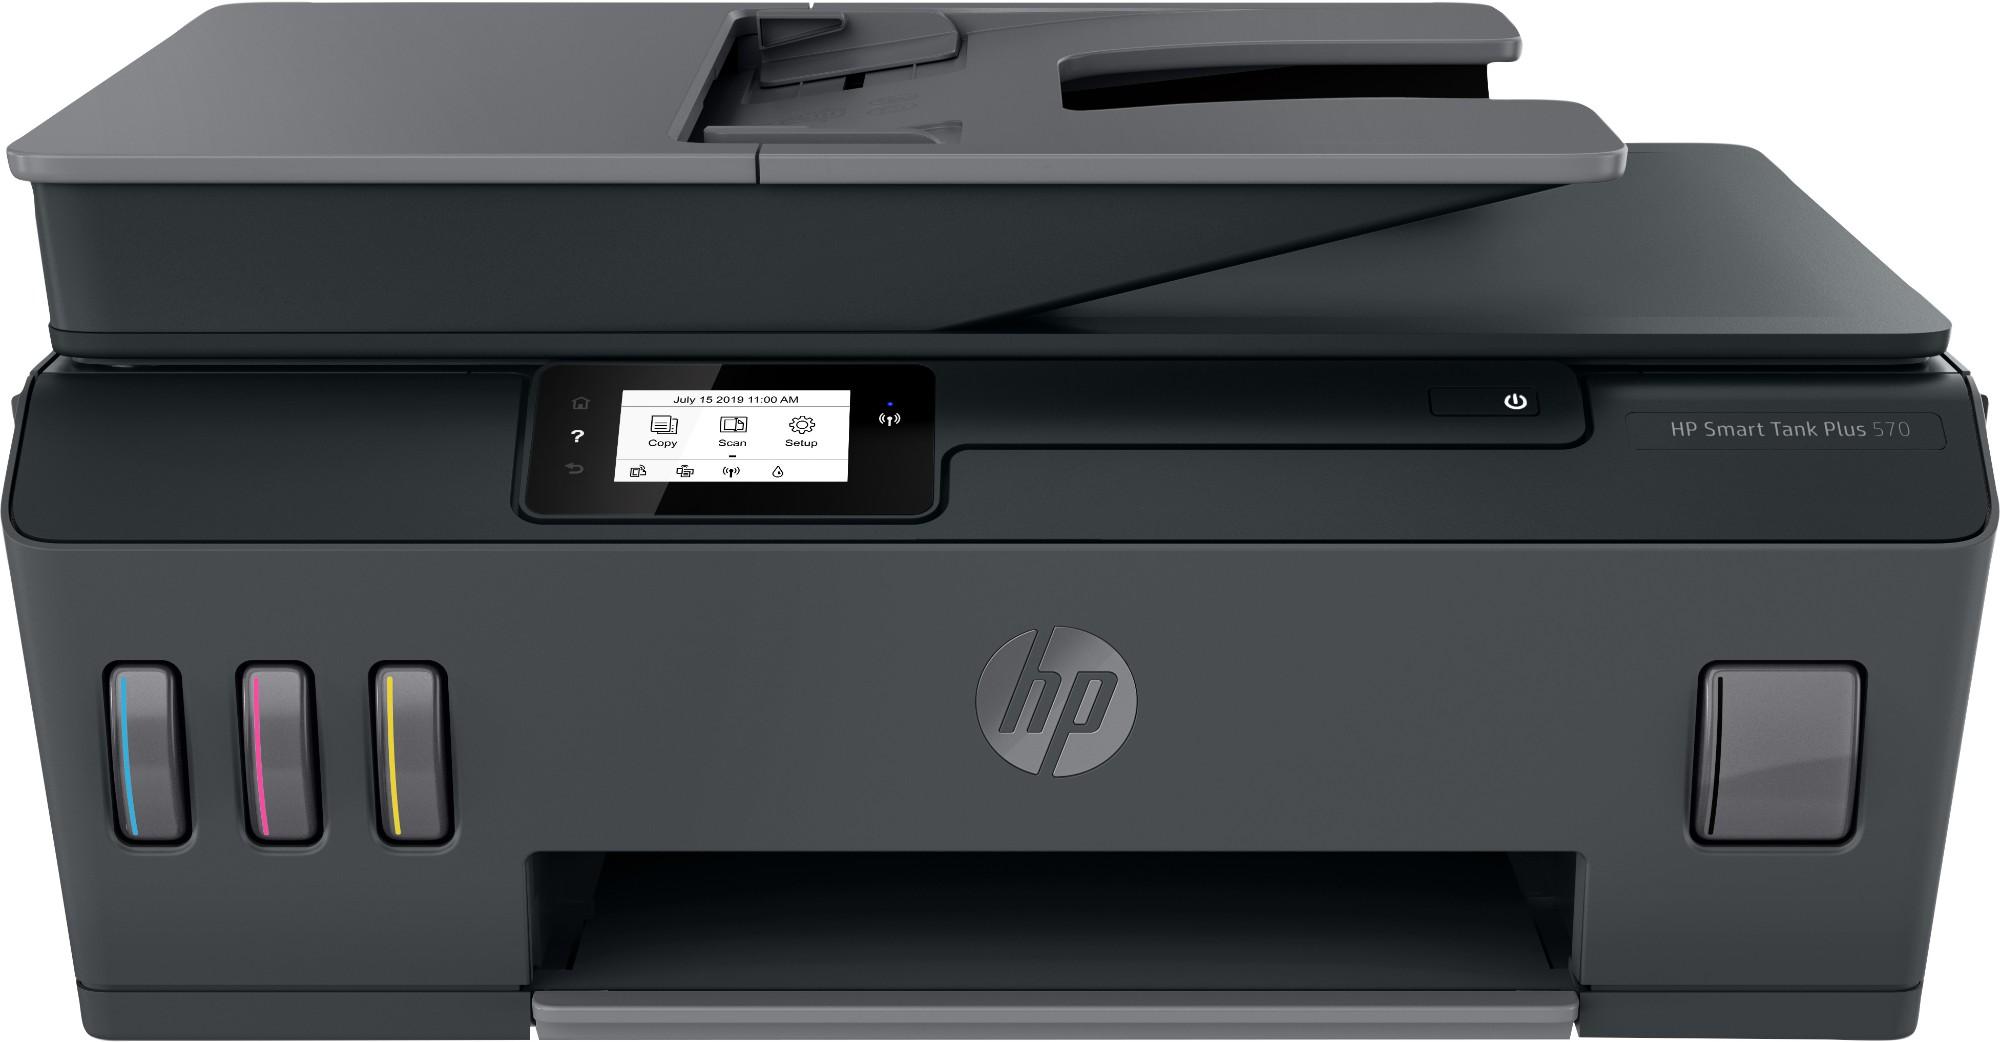 HP Smart Tank Plus 570 Thermal Inkjet 4800 x 1200 DPI 11 ppm A4 Wi-Fi